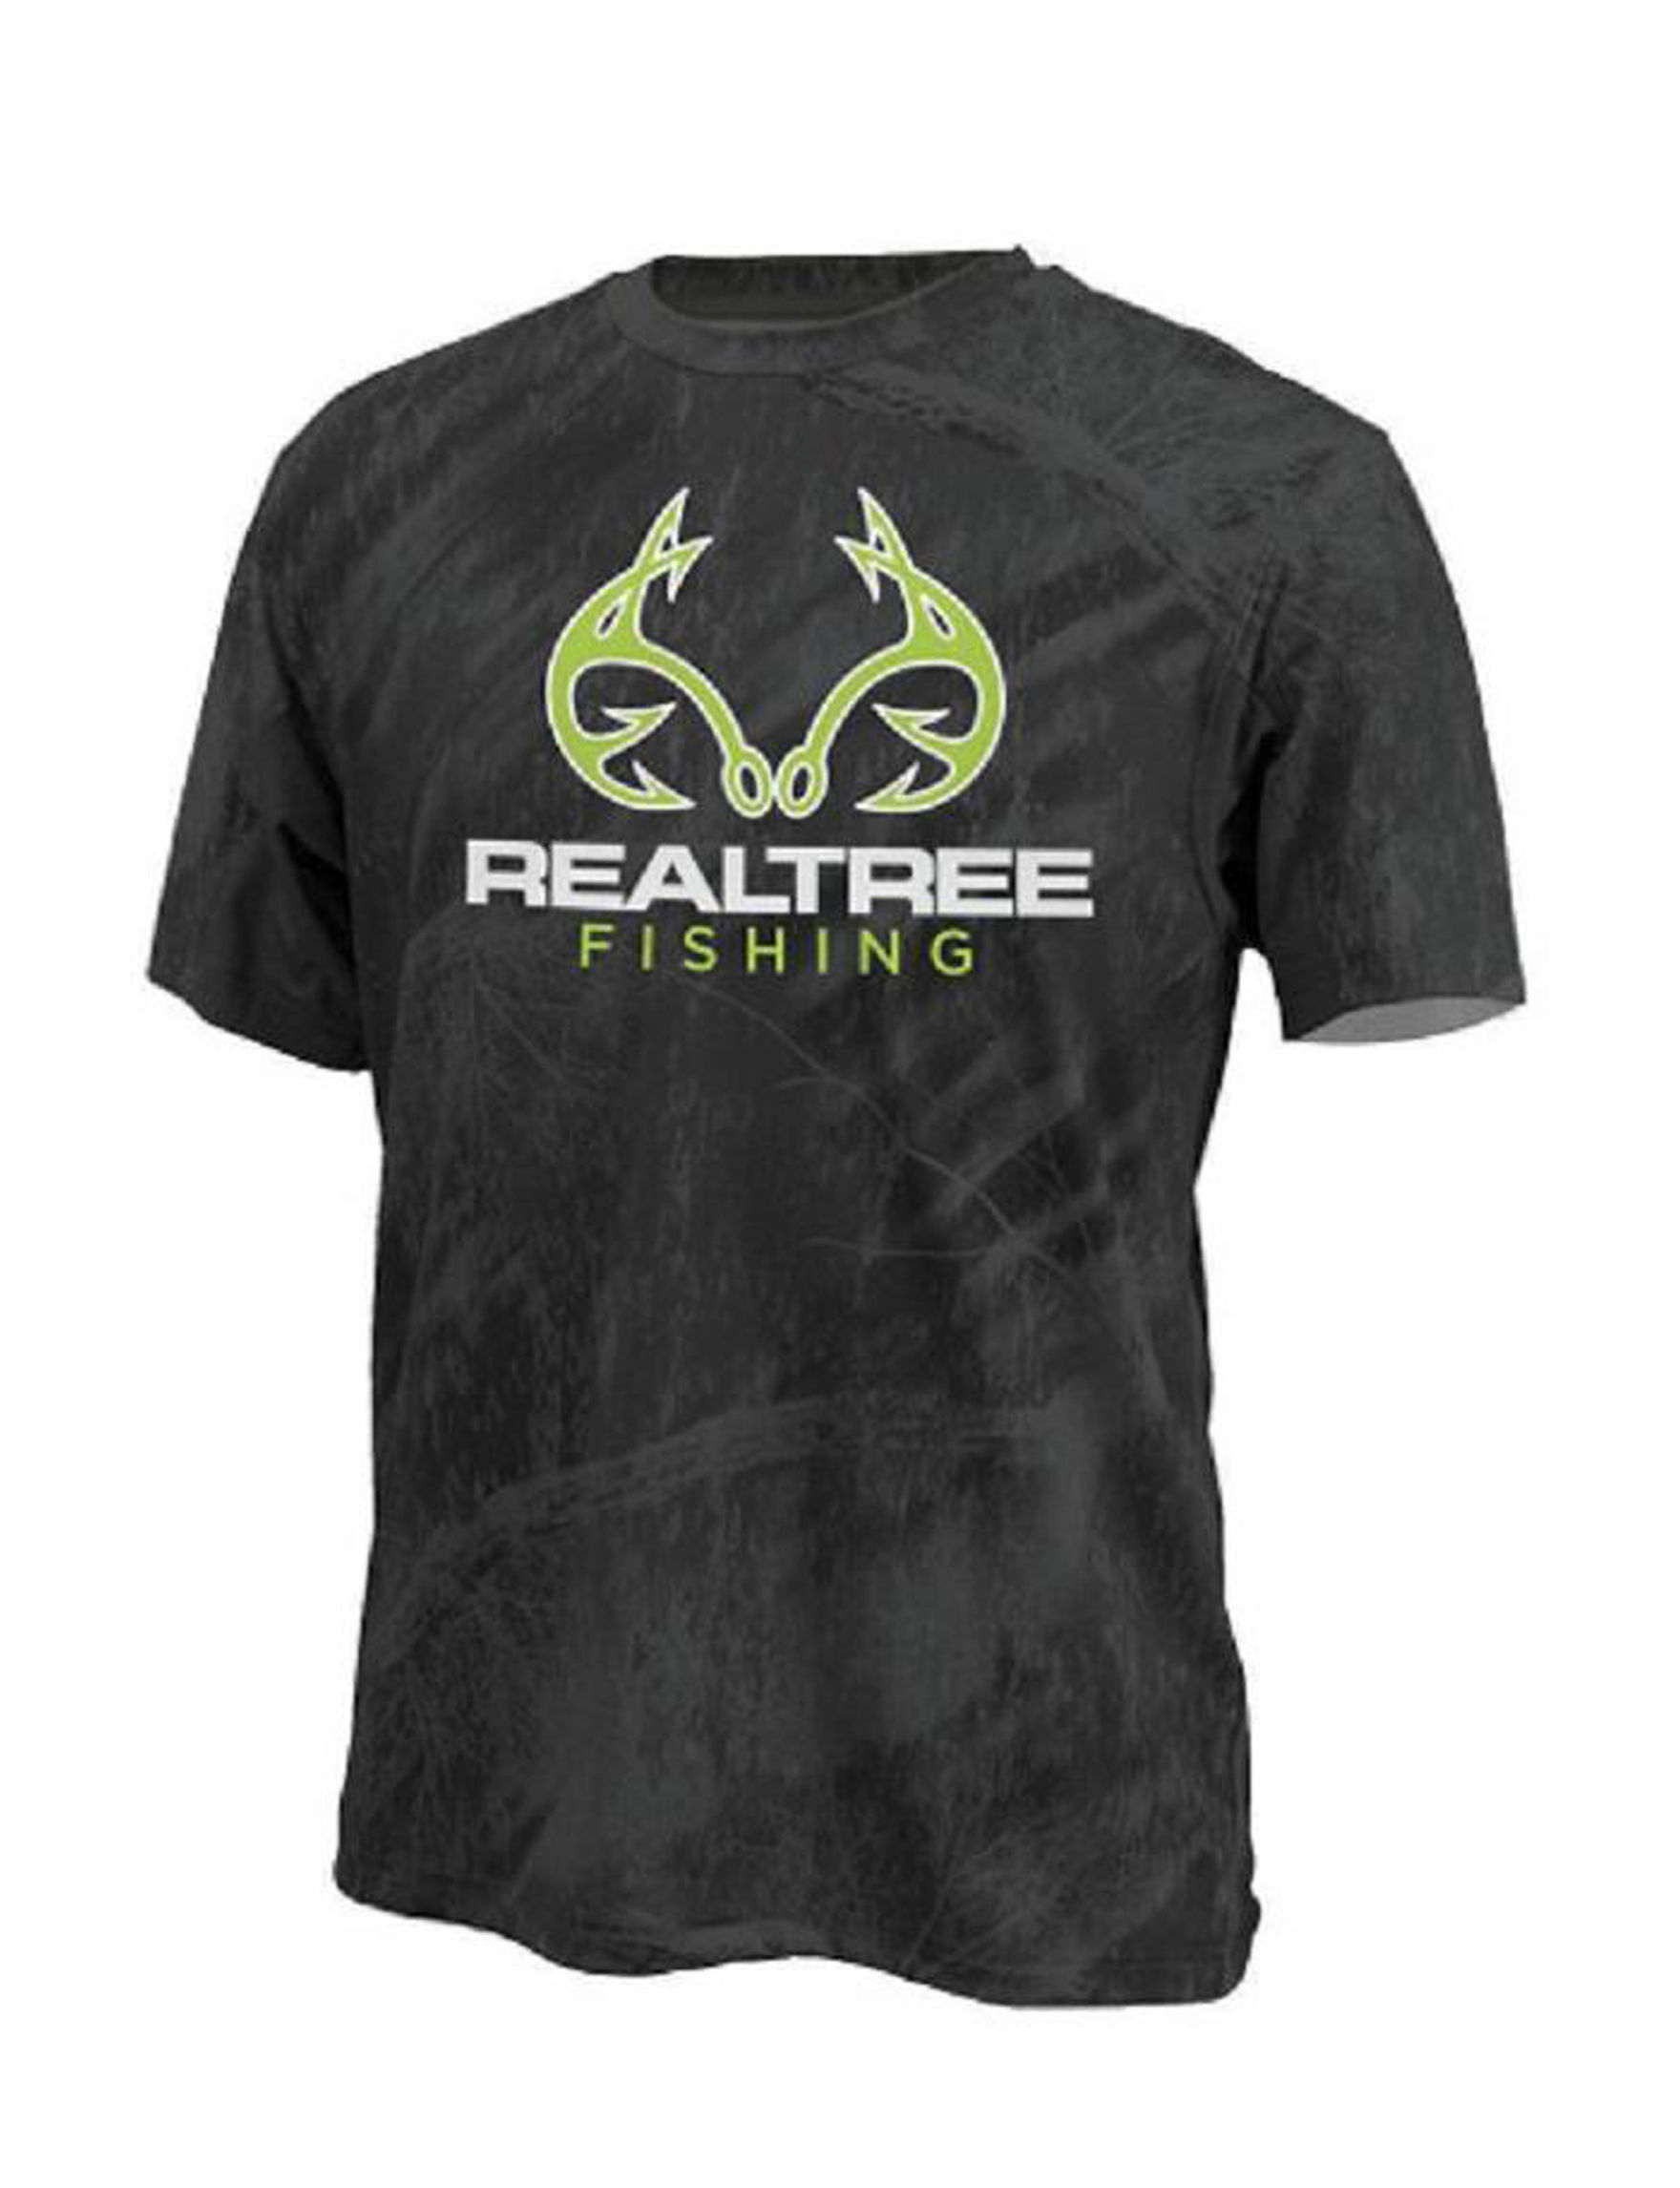 Realtree Black Tees & Tanks